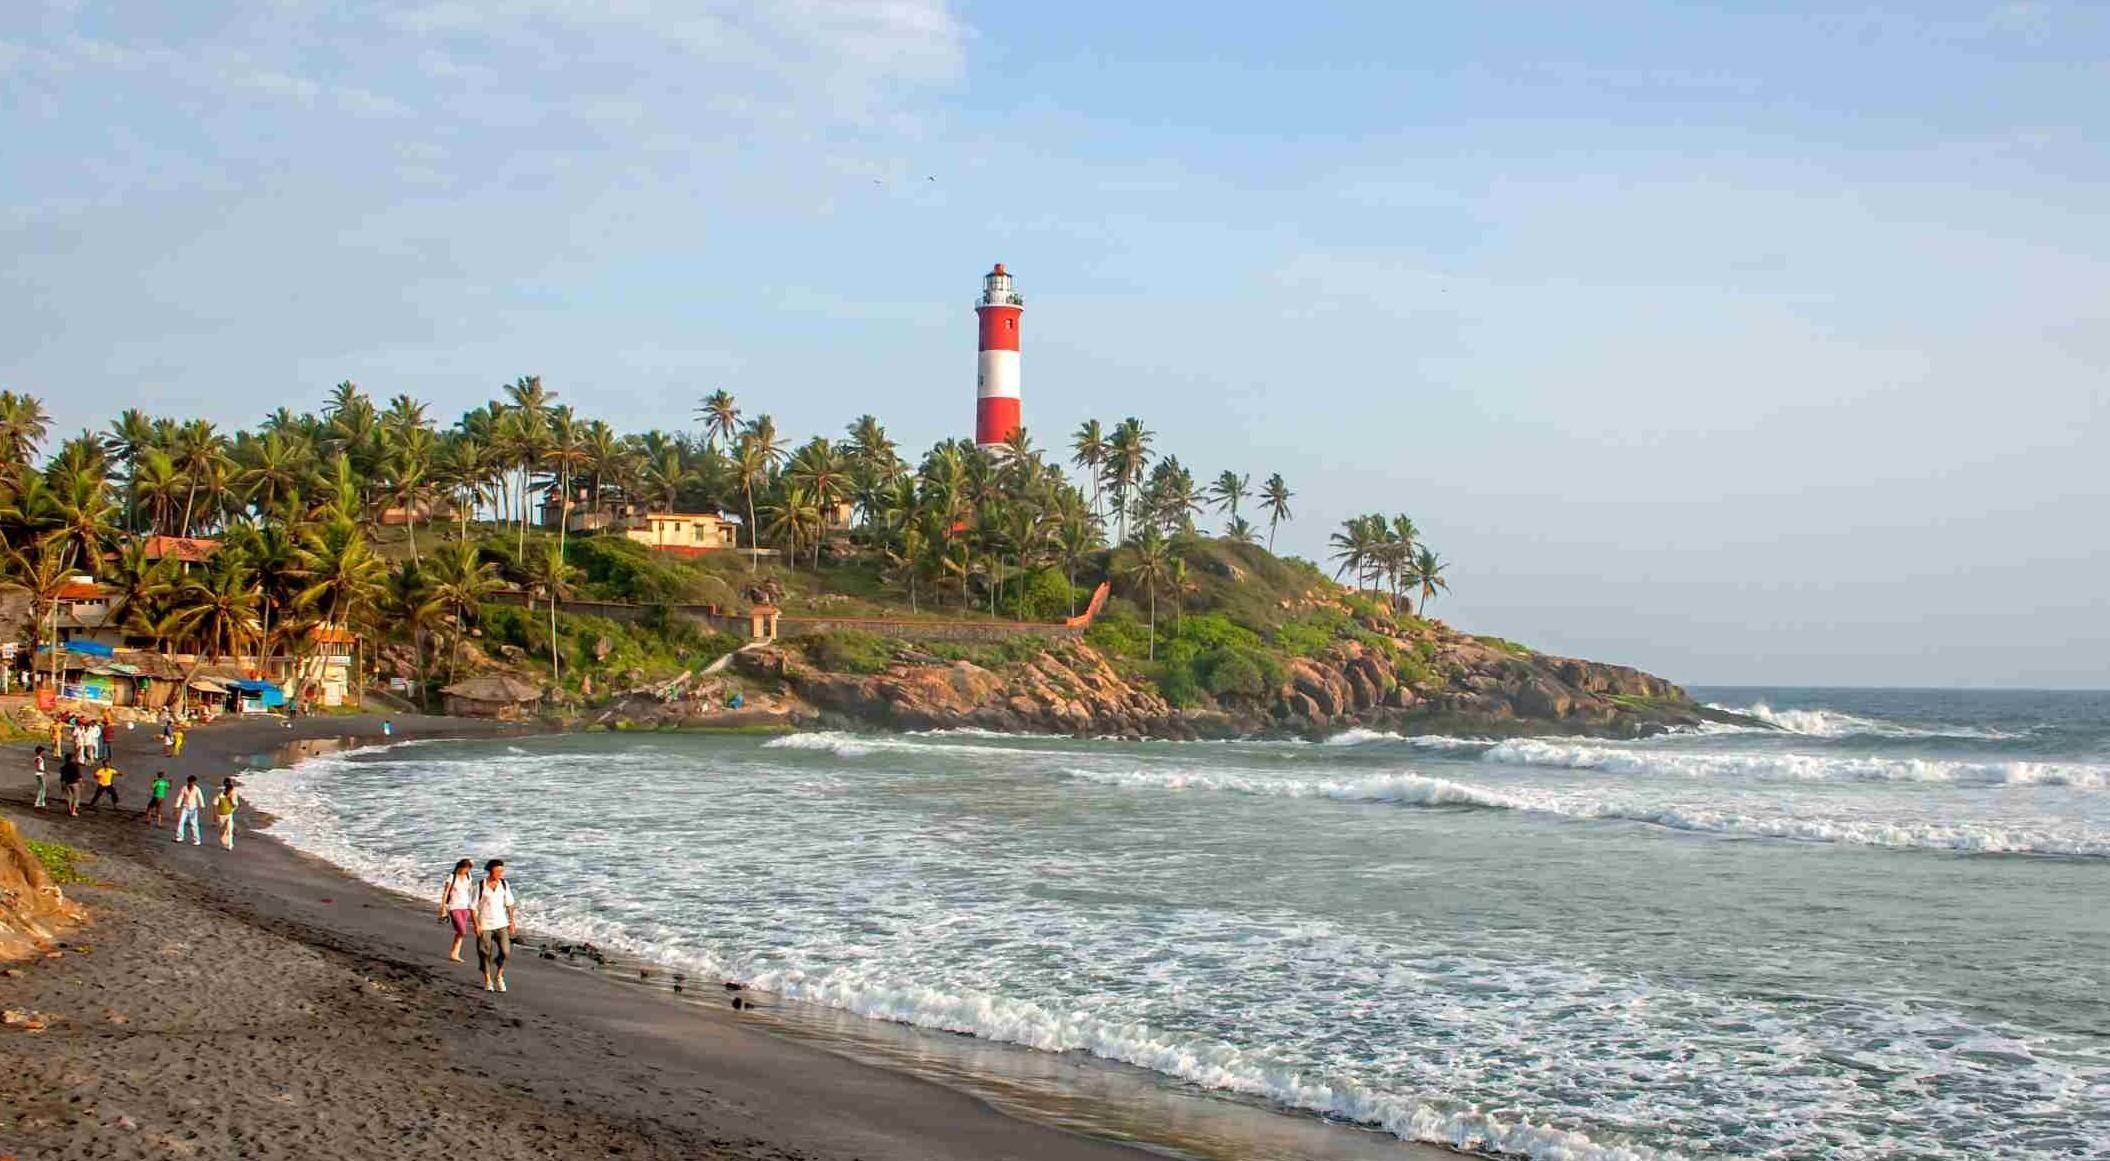 Kovalam is an internationally renowned beach